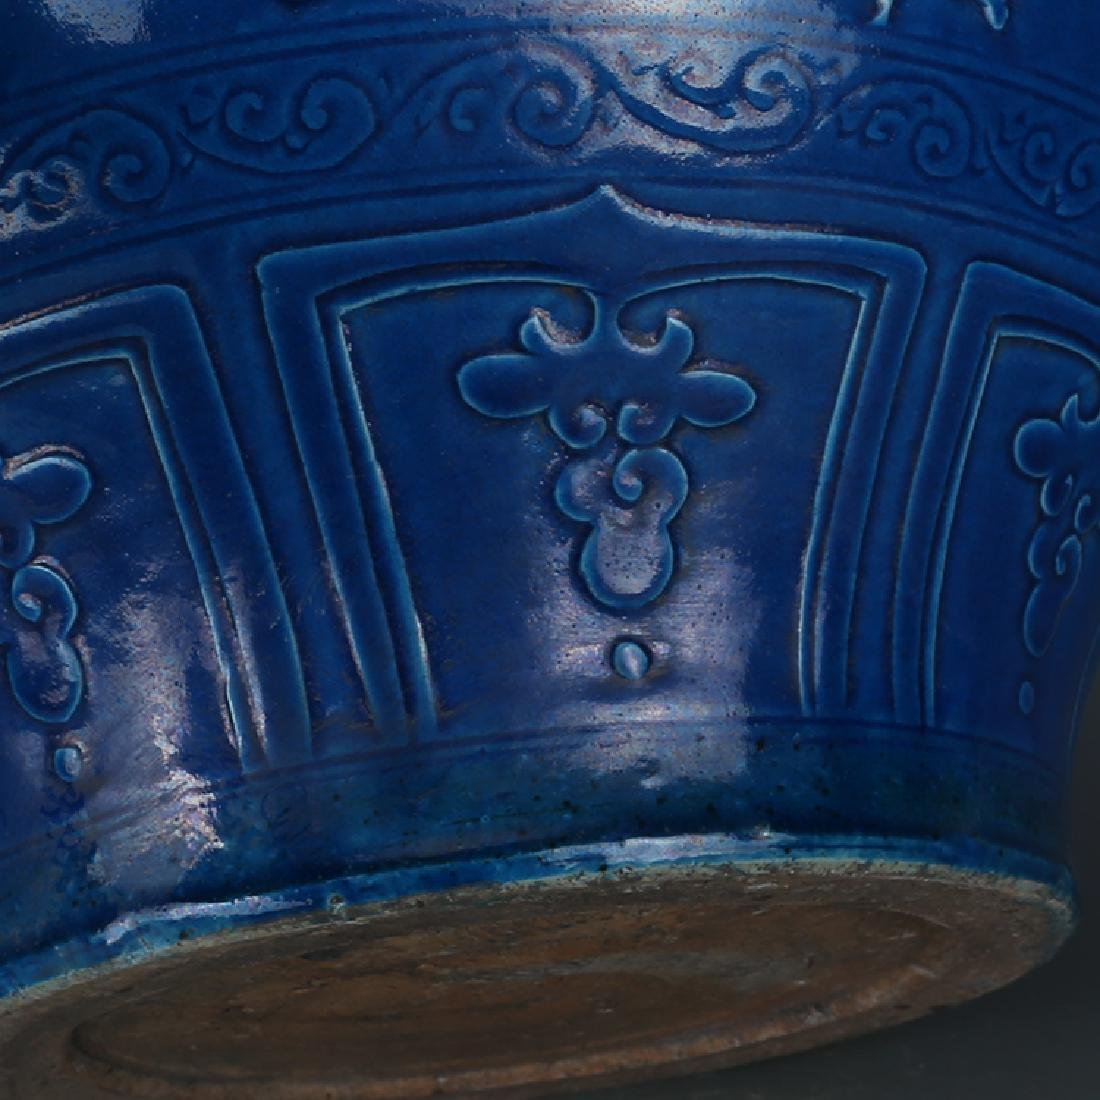 Chinese  Blue Porcelain  Jar - 10